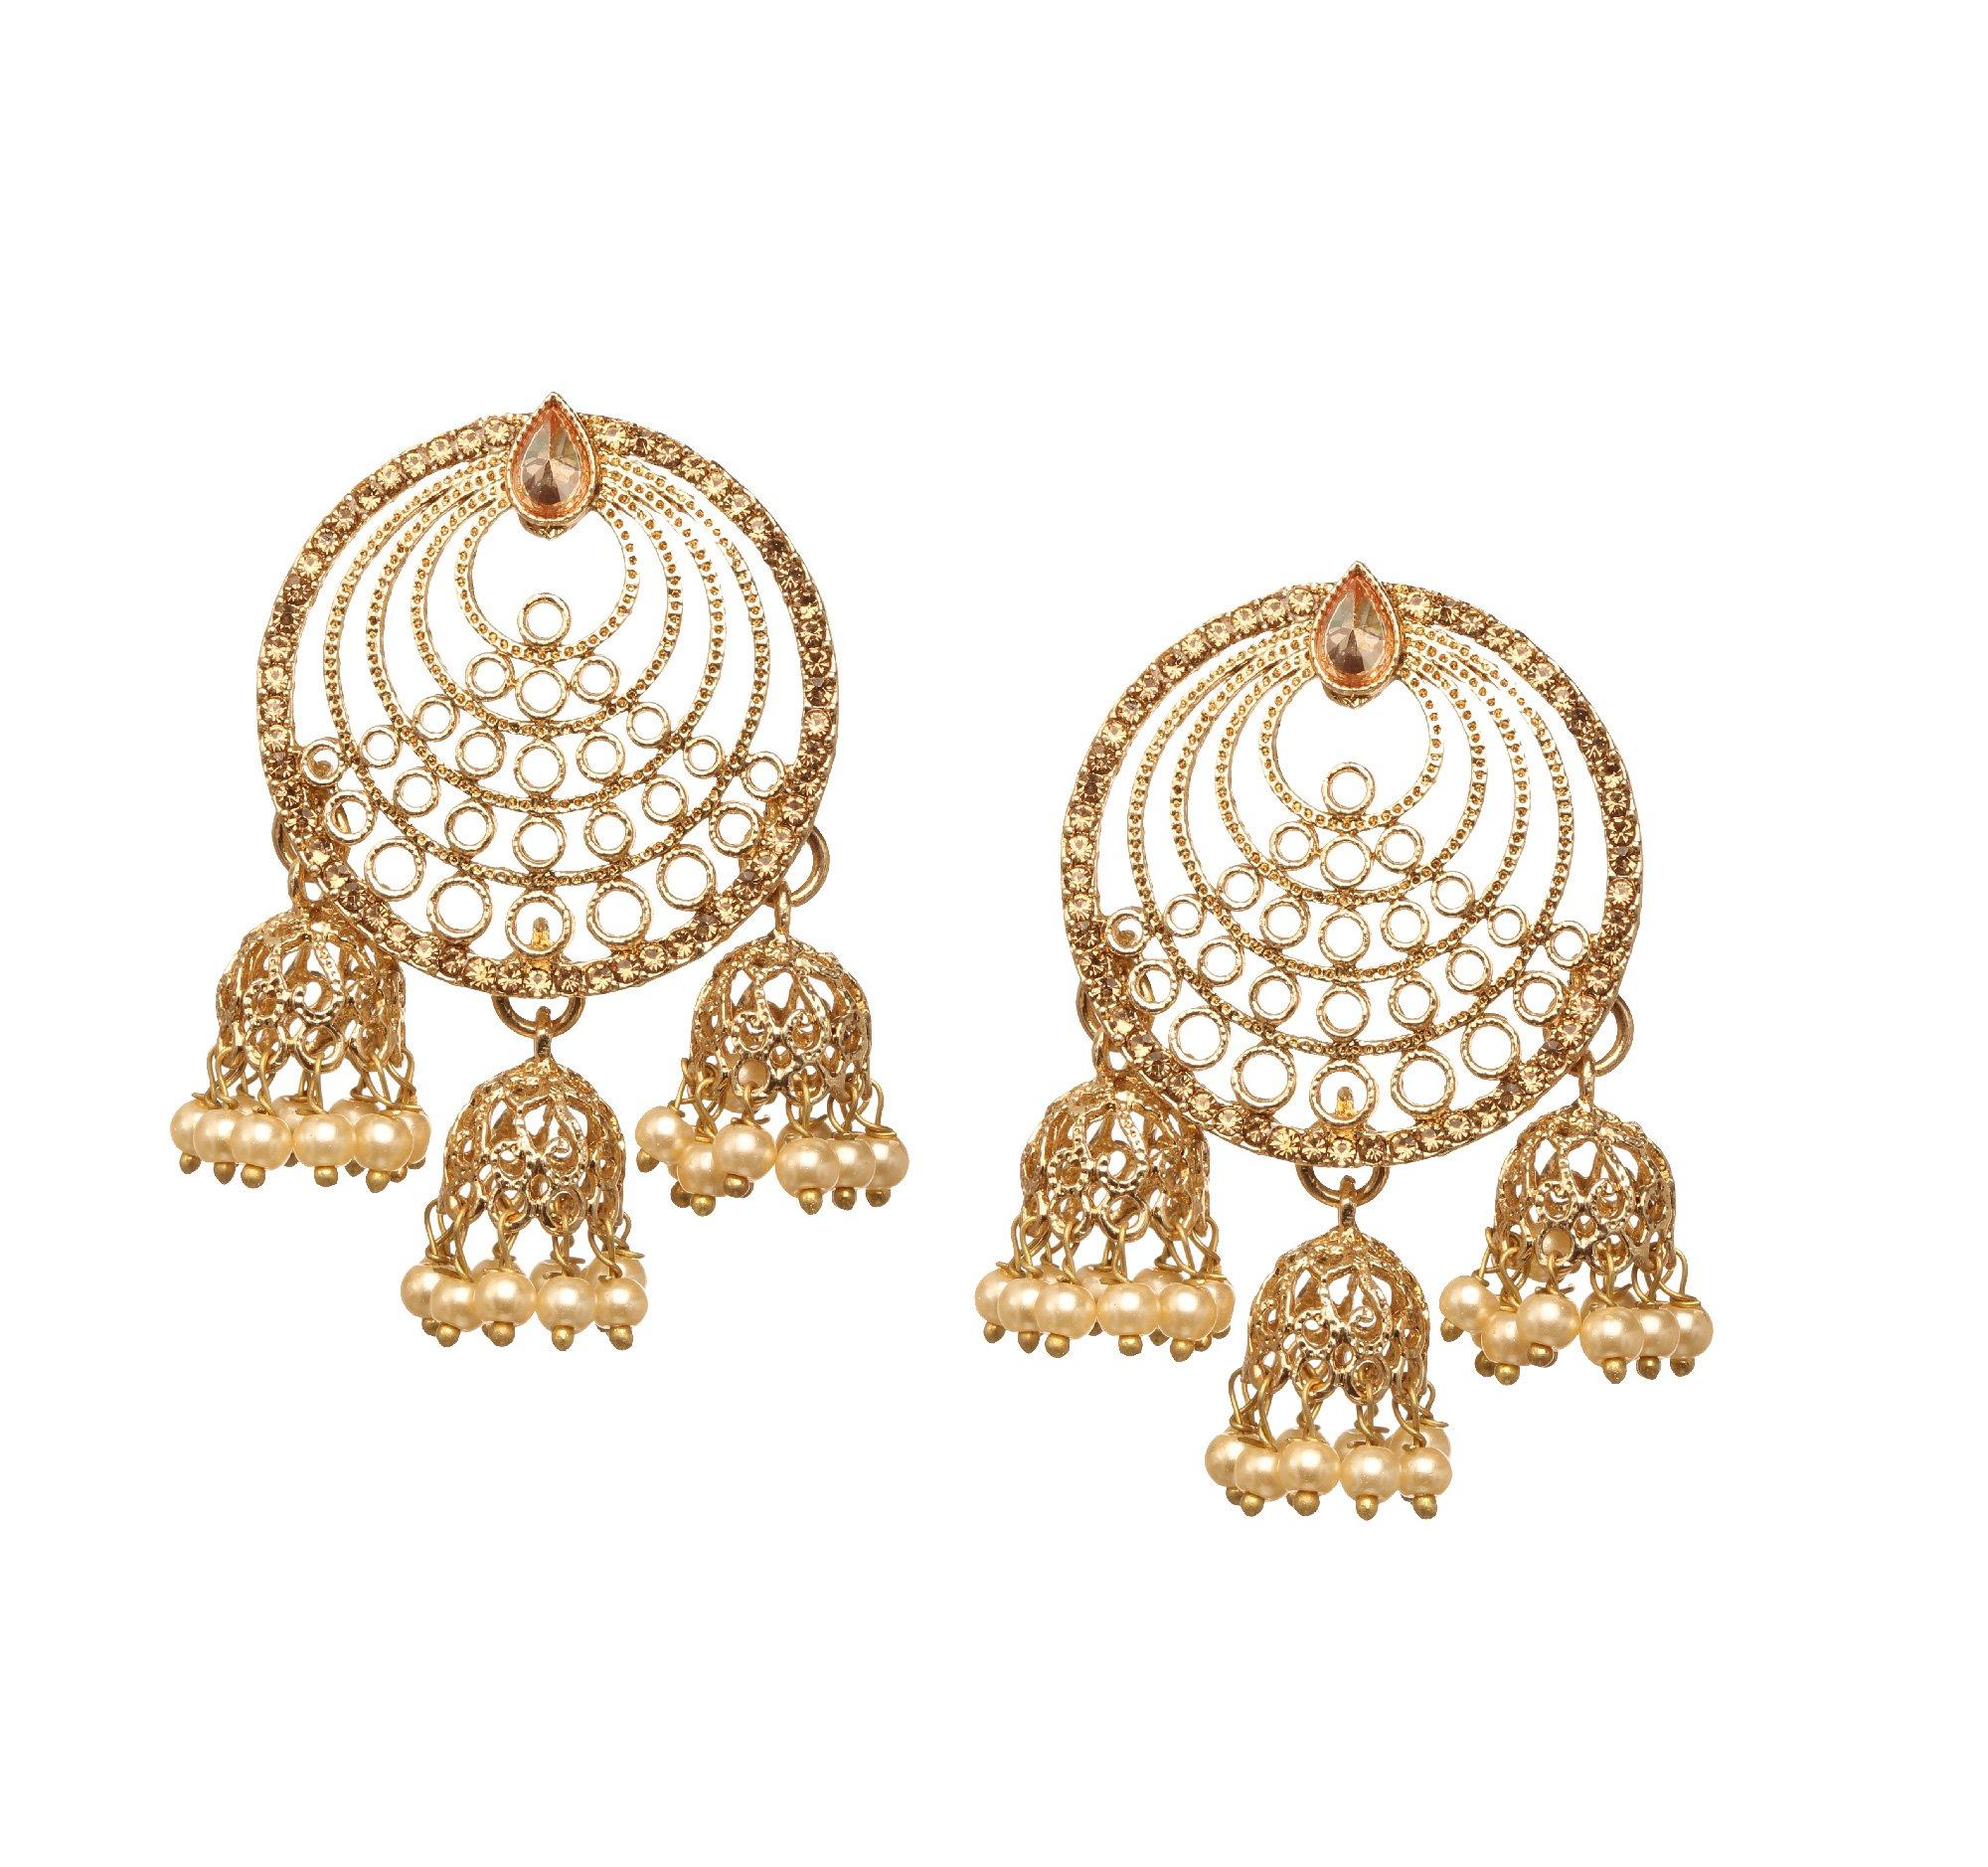 Bindhani Premium Bollywood Stylish Wedding Golden Stone Bahubali Devsena Indian Dangle Jhumka Jewelry Jhumki Earrings For Women